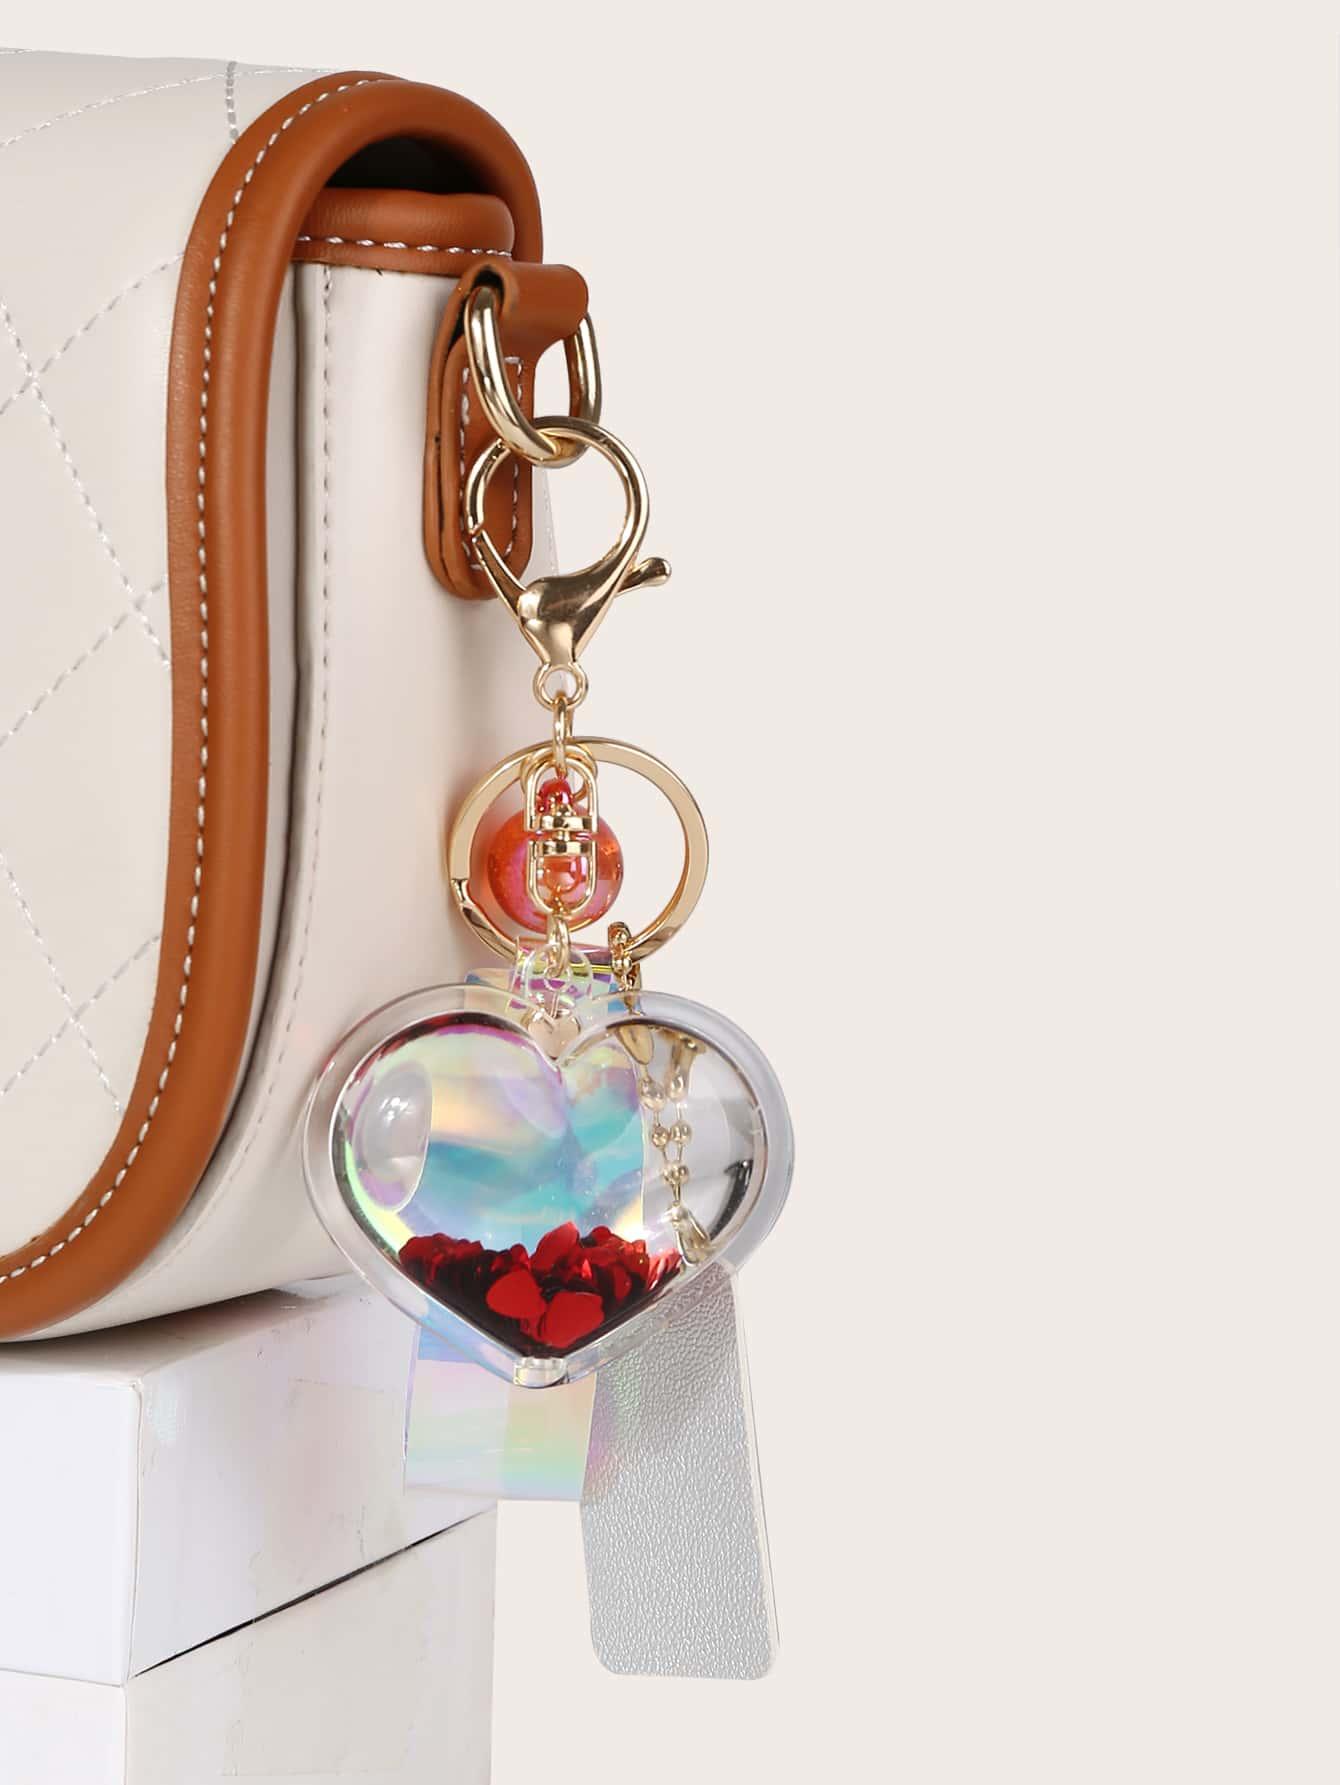 Подвеска для сумки в форме сердечка с декоромswbag18200522542